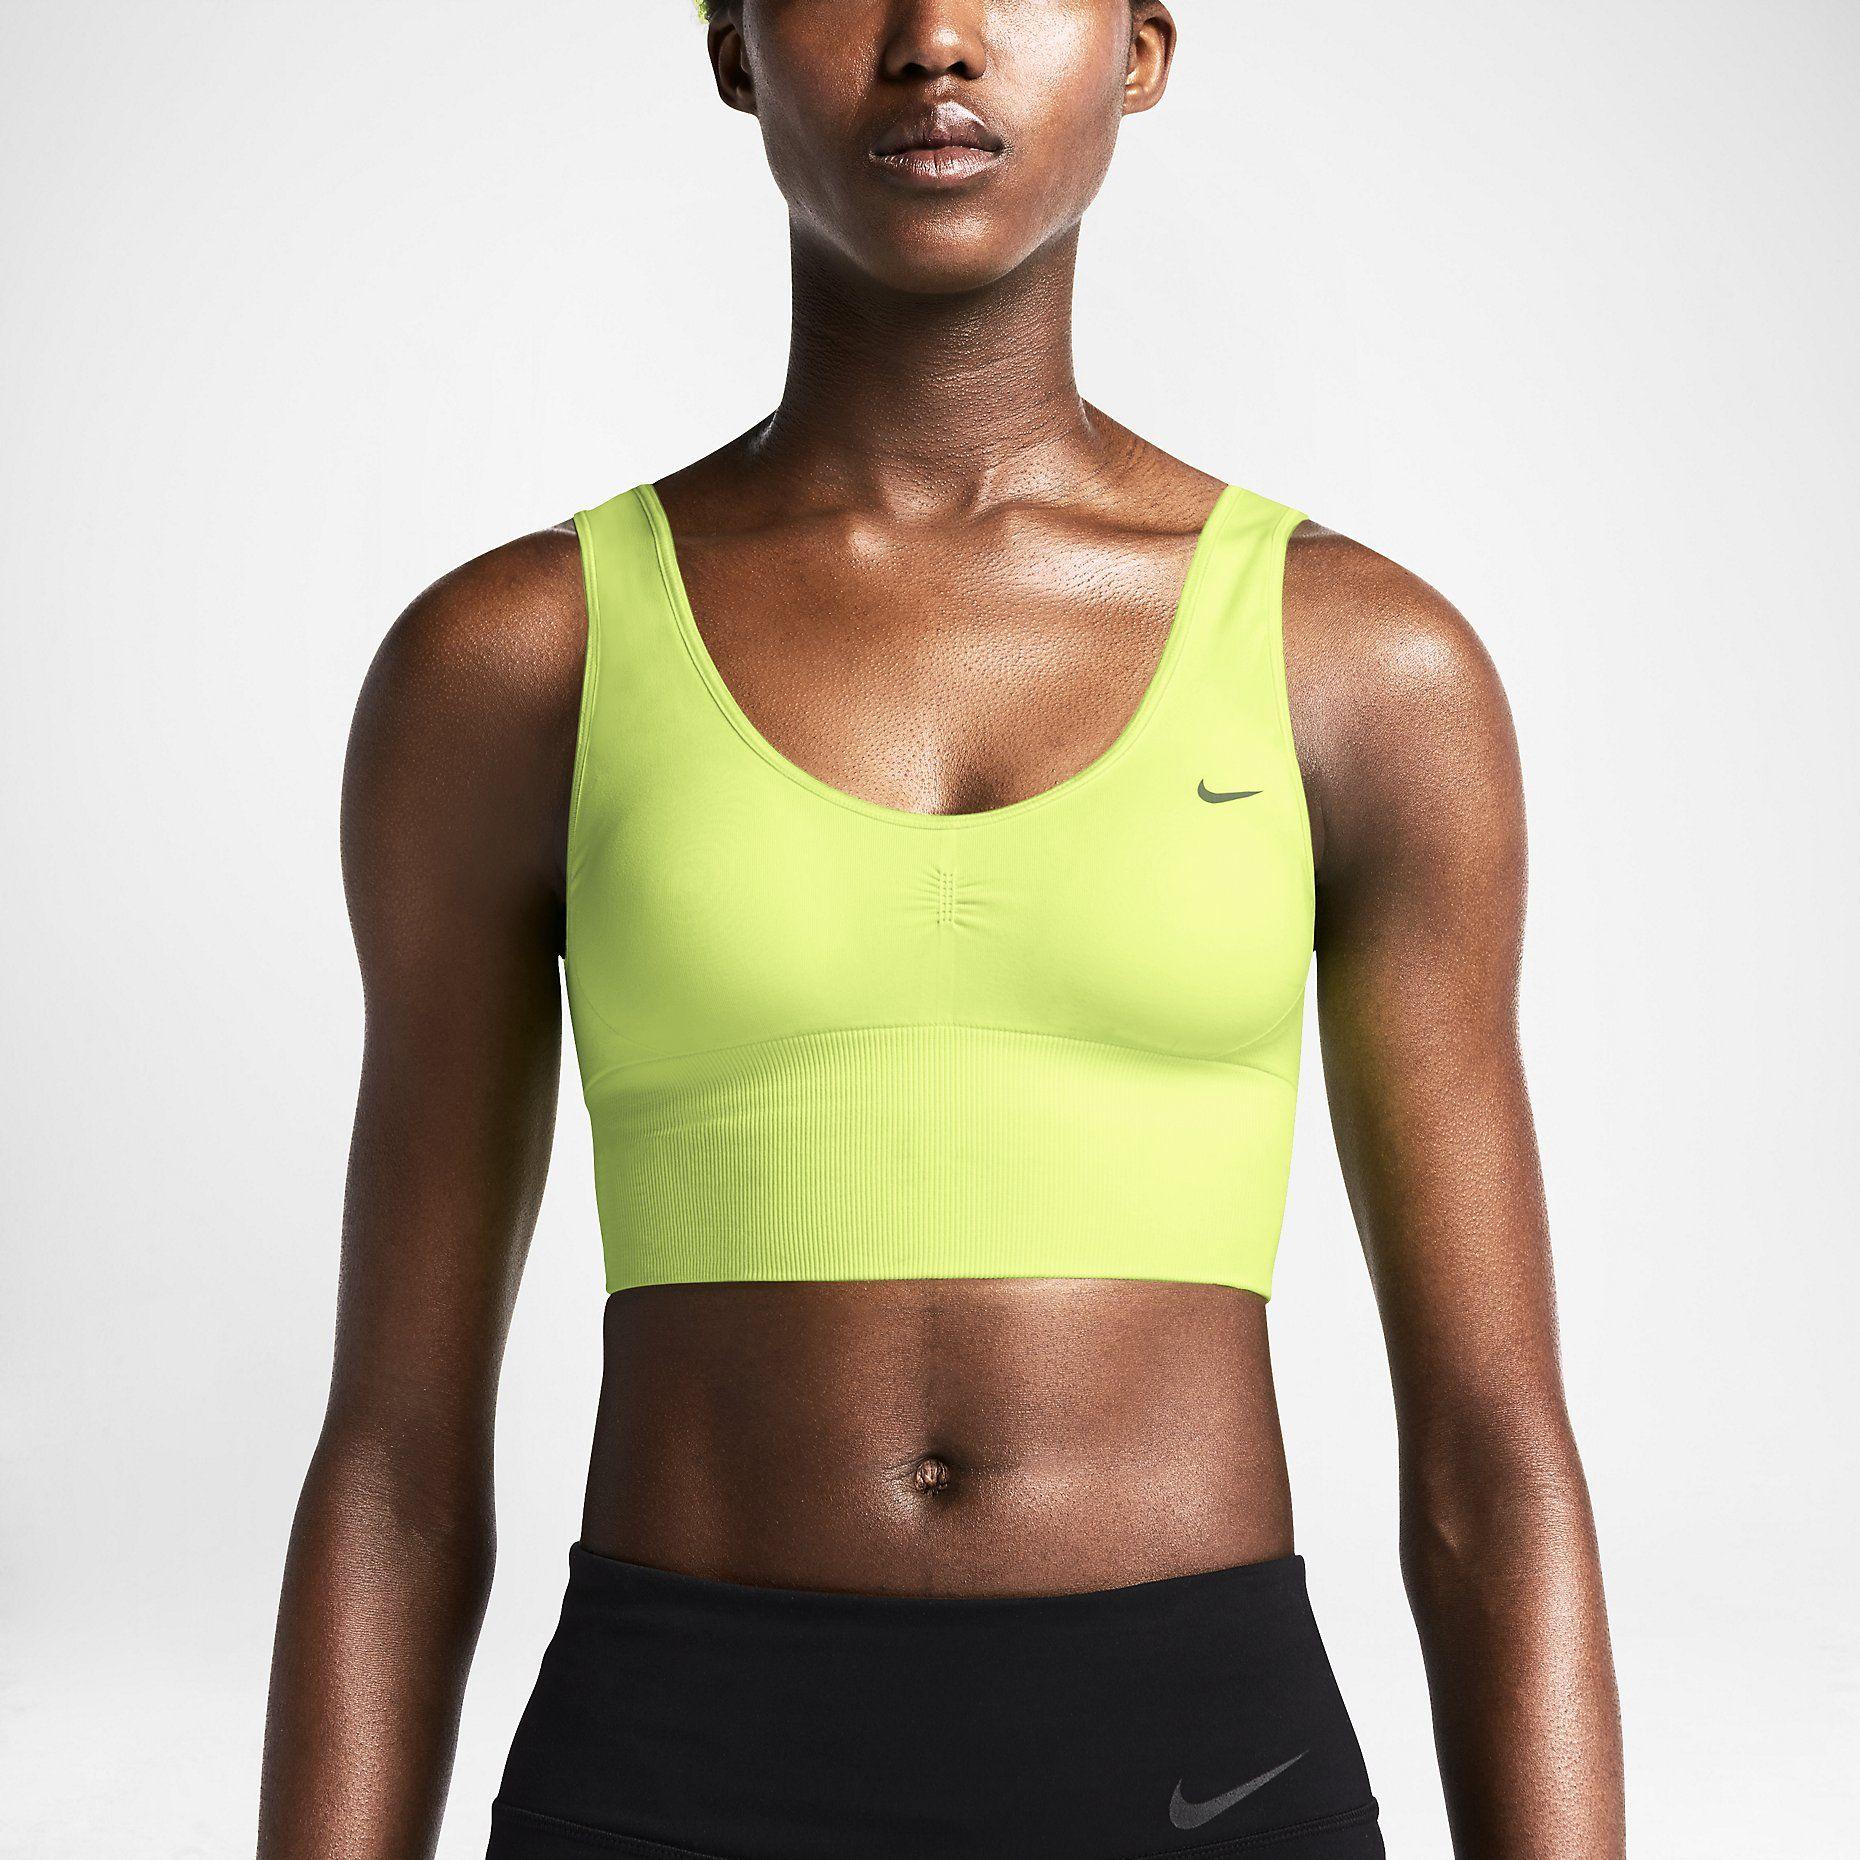 0245bdba5a Nike Seamless Women s Training Bralette. Nike Store